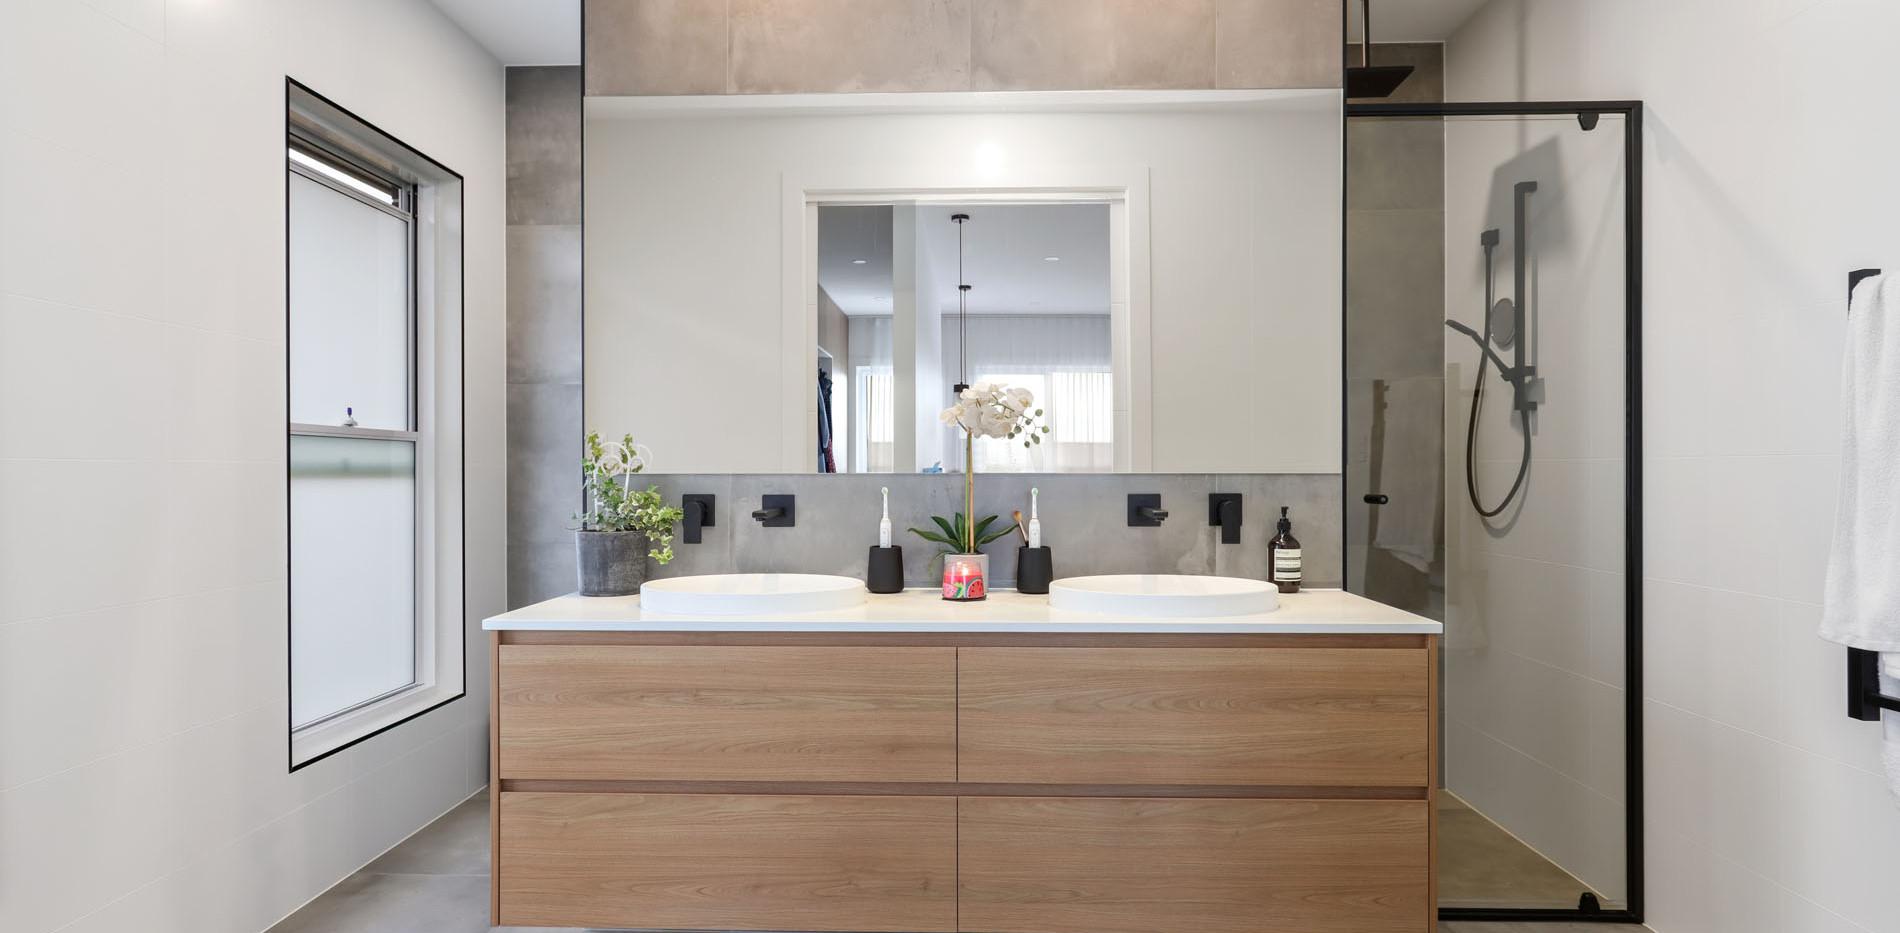 Hawkesbury bathrooms and Kitchens (61)